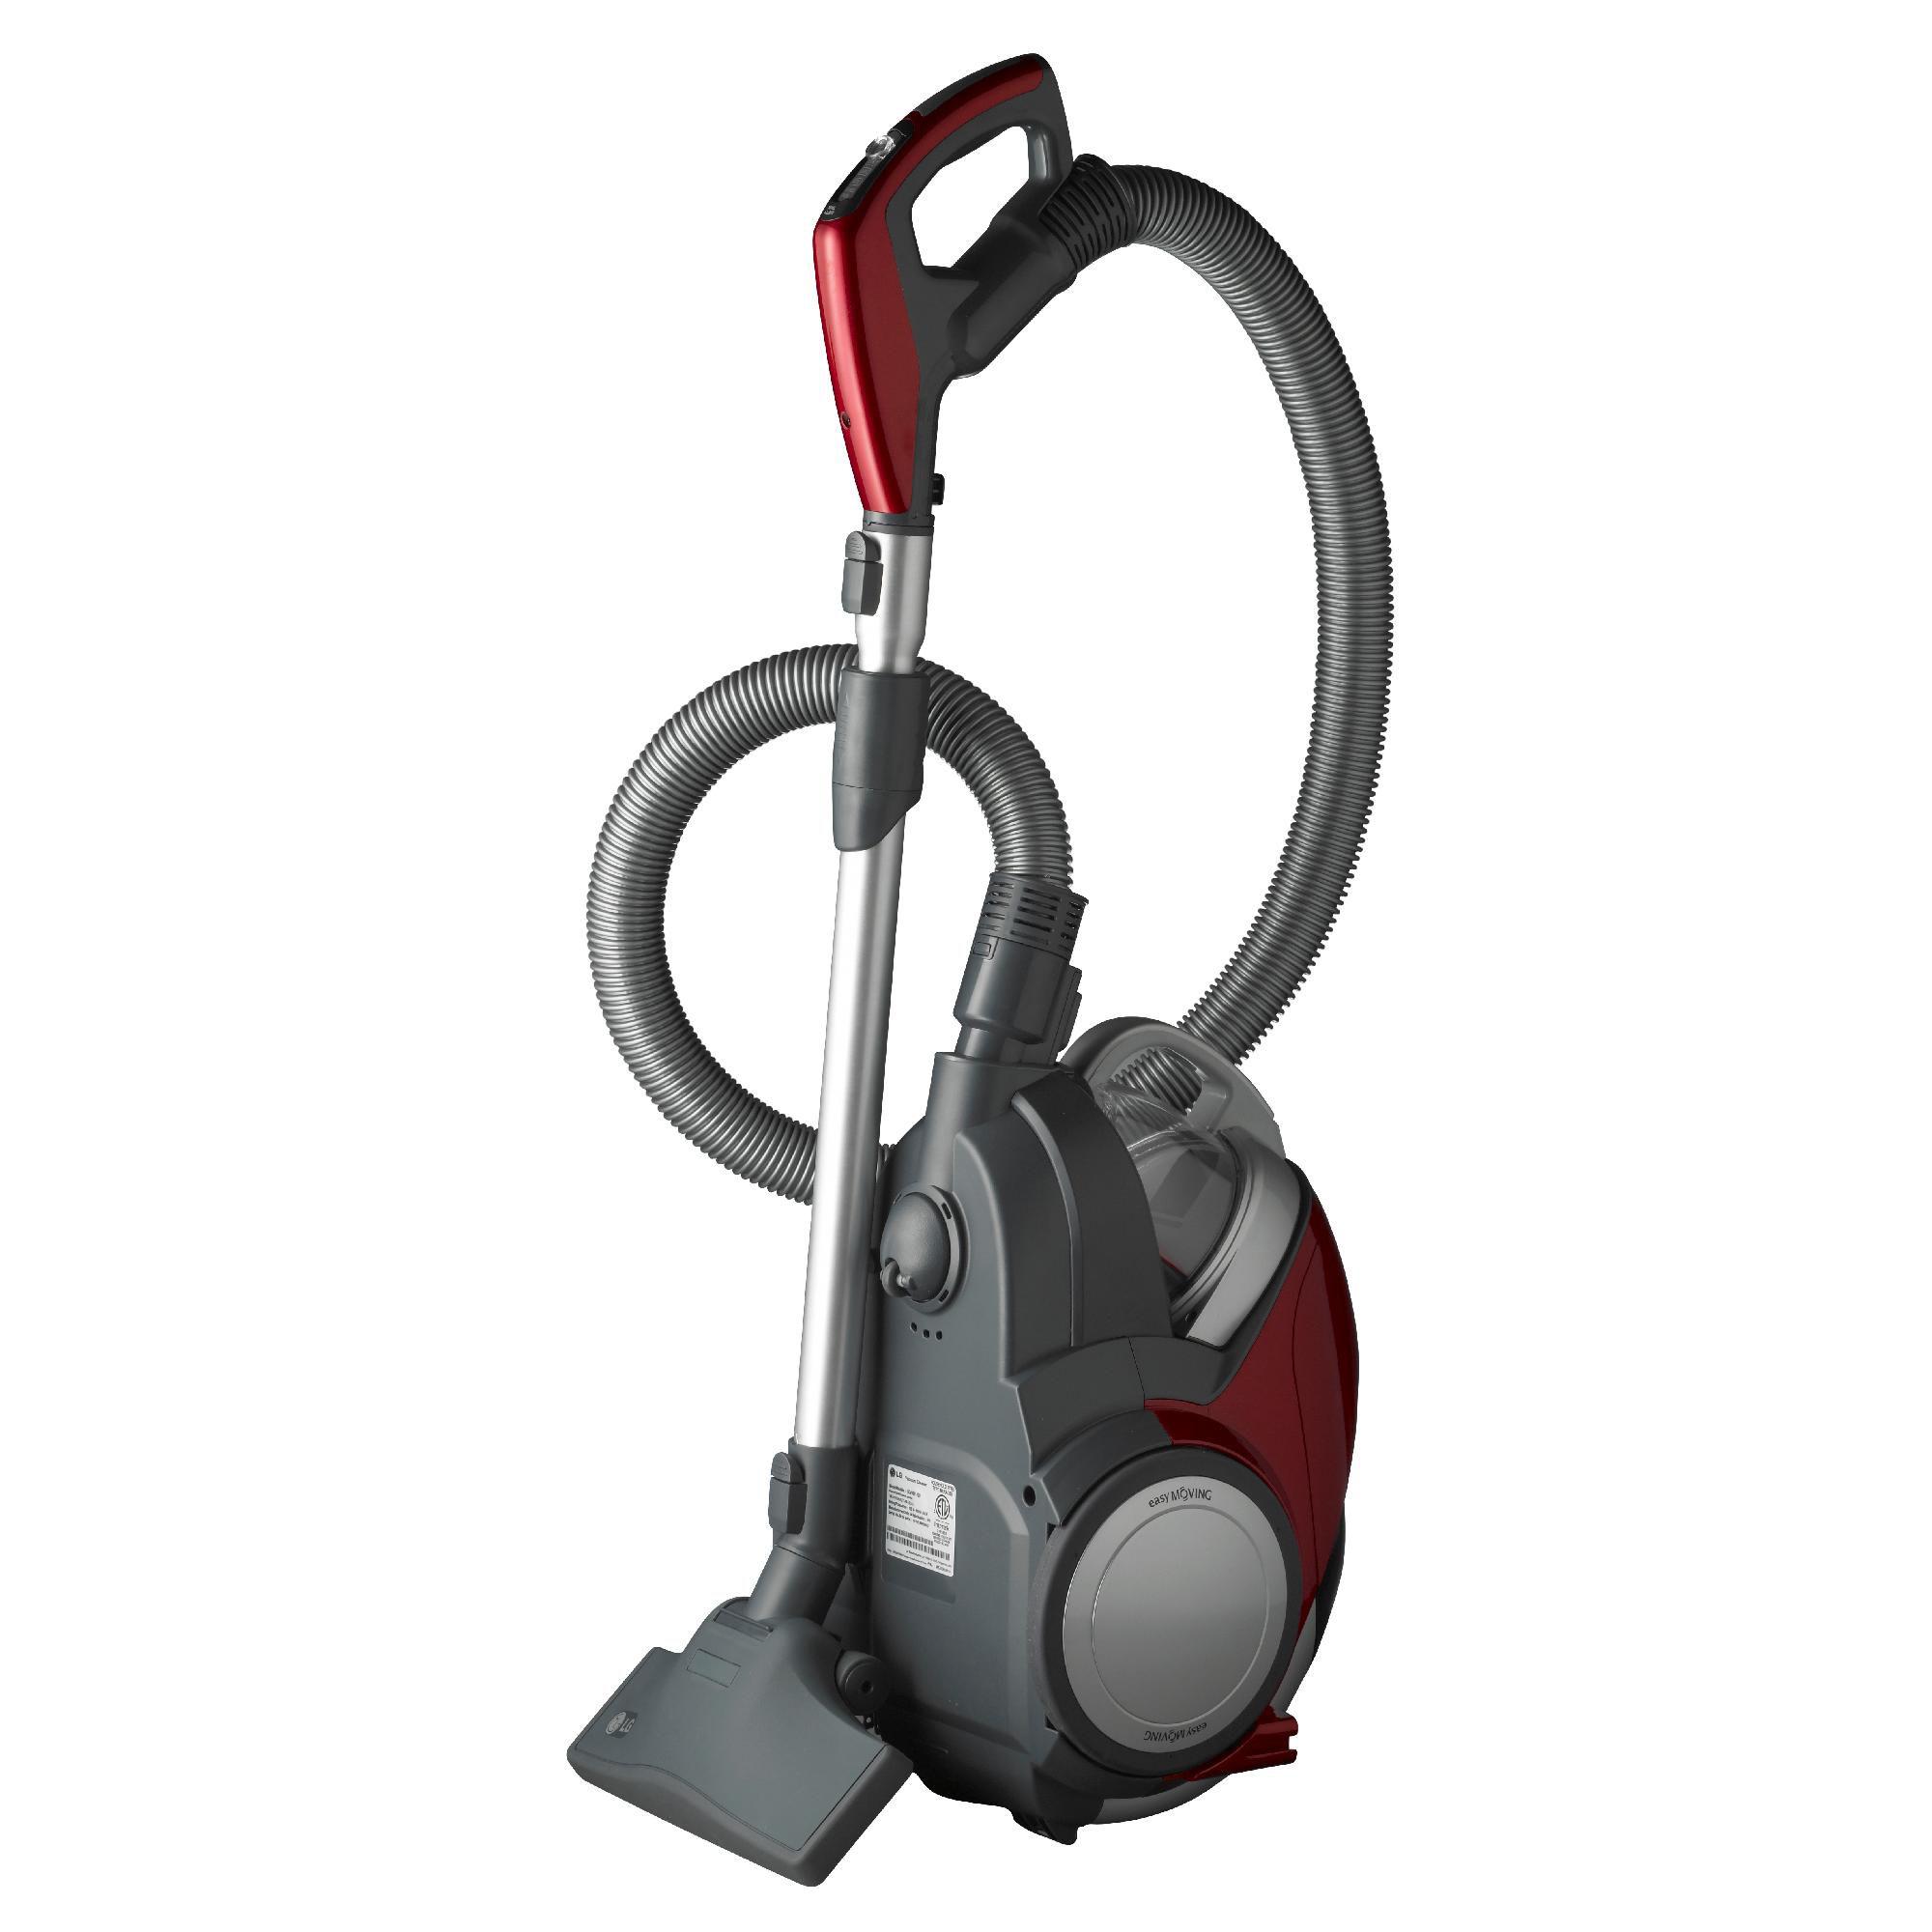 LG KOMPRESSOR® Canister PetCare Vacuum - LCV800R